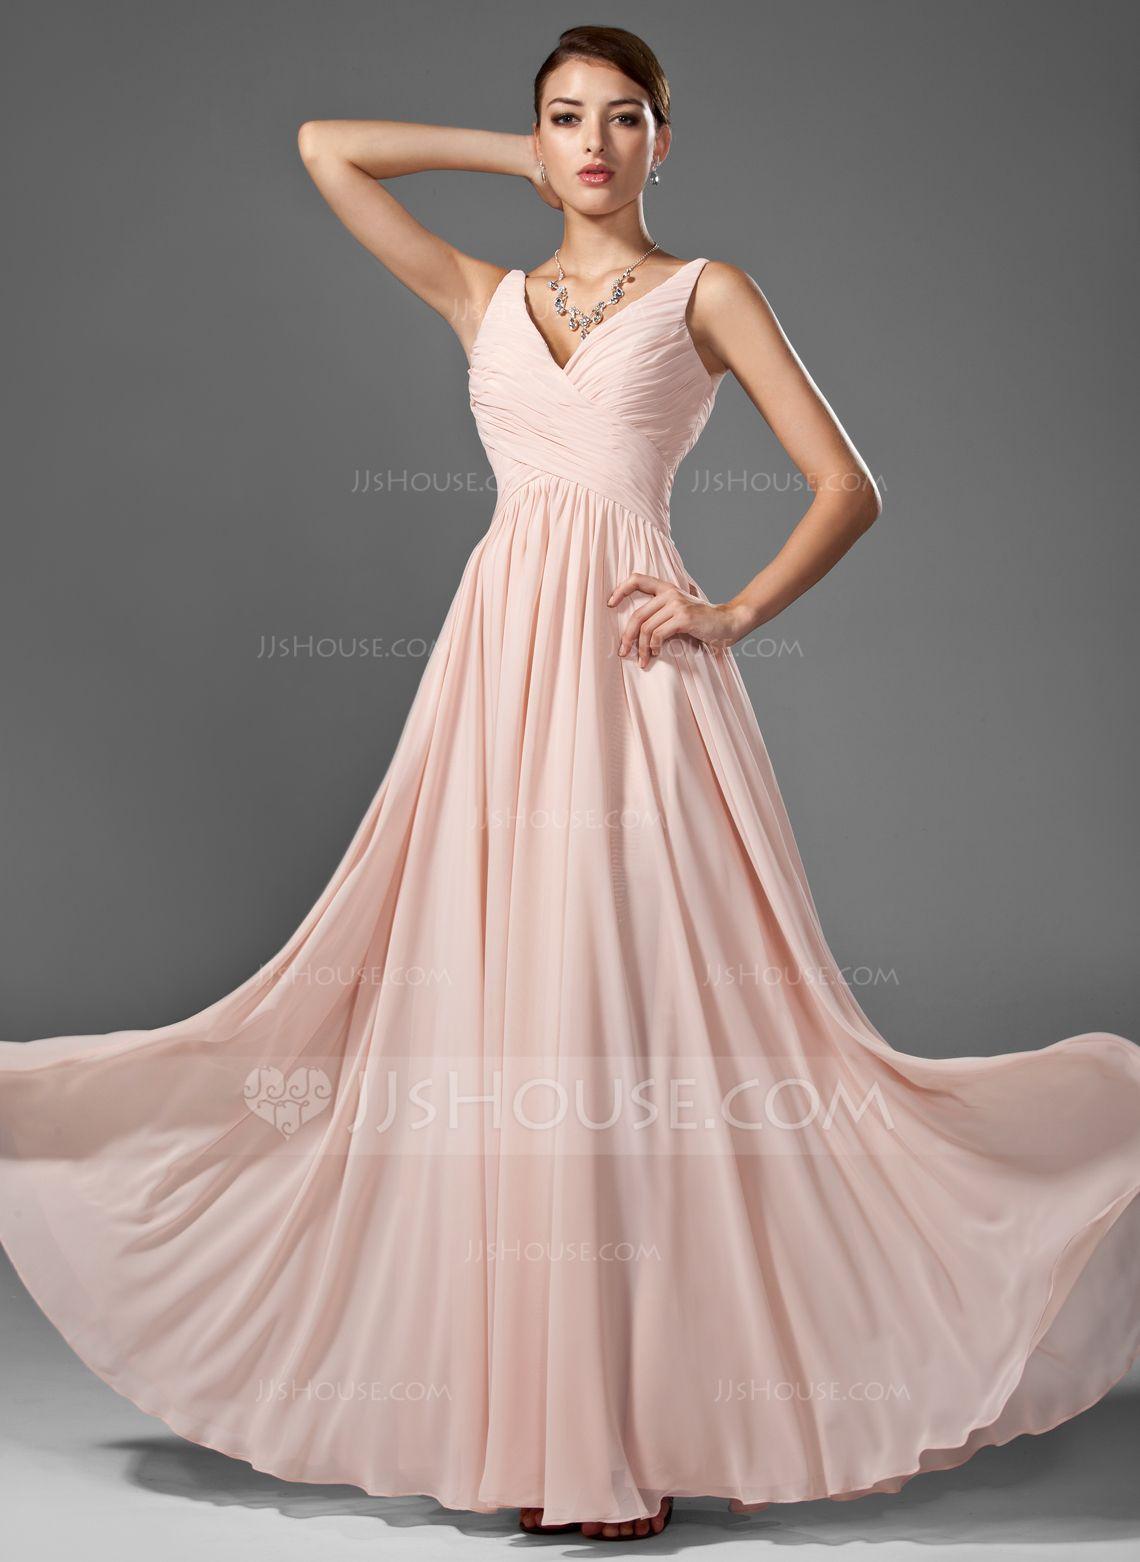 A-Line/Princess V-neck Floor-Length Chiffon Prom Dress With Ruffle ...